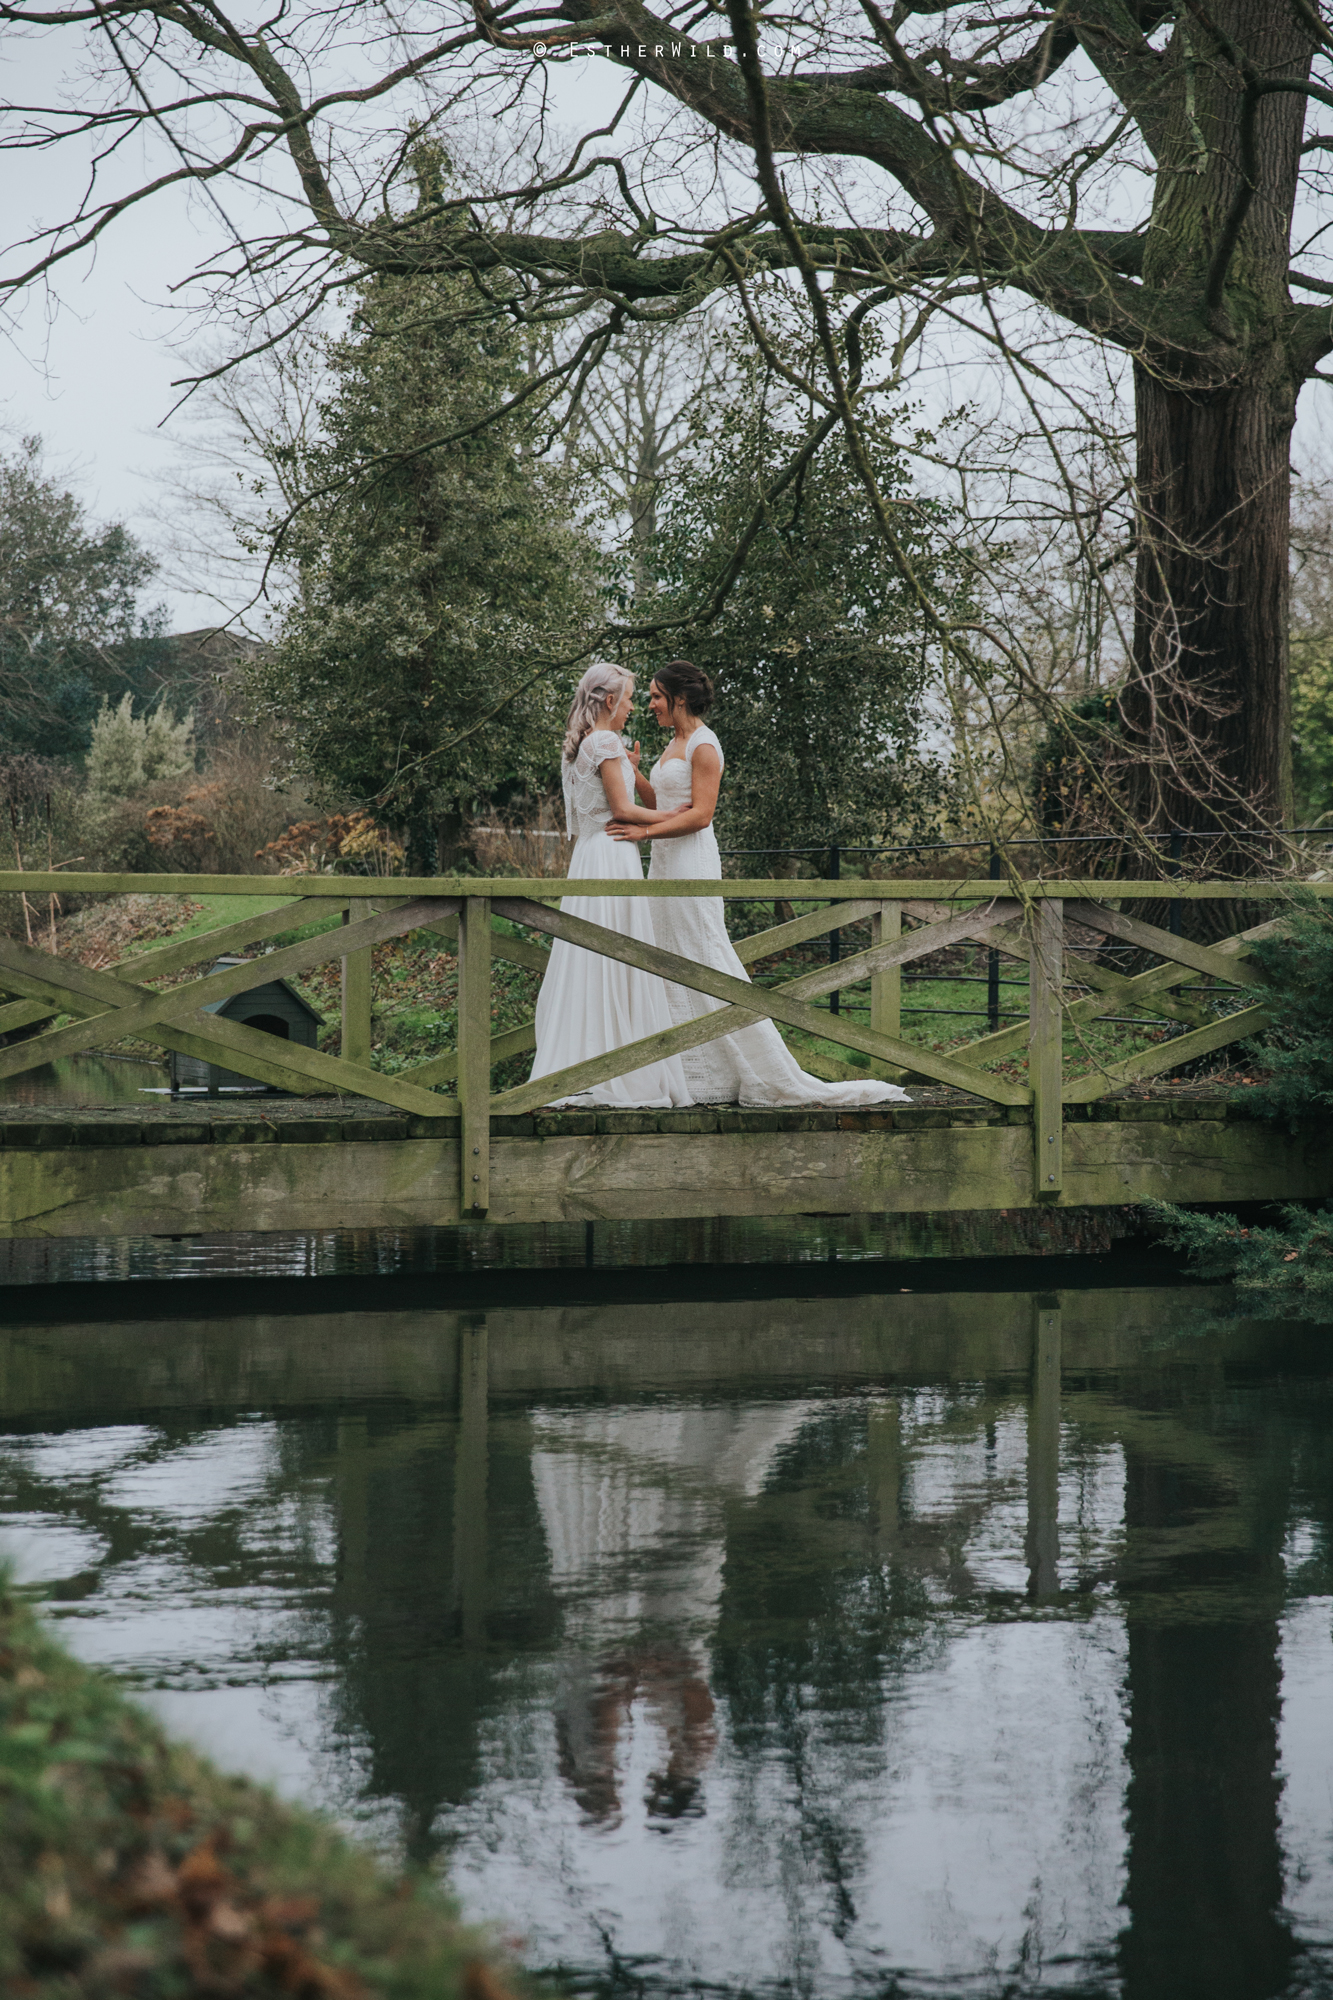 Elms_Barn_Weddings_Suffolk_Photographer_Copyright_Esther_Wild_IMG_1978.jpg